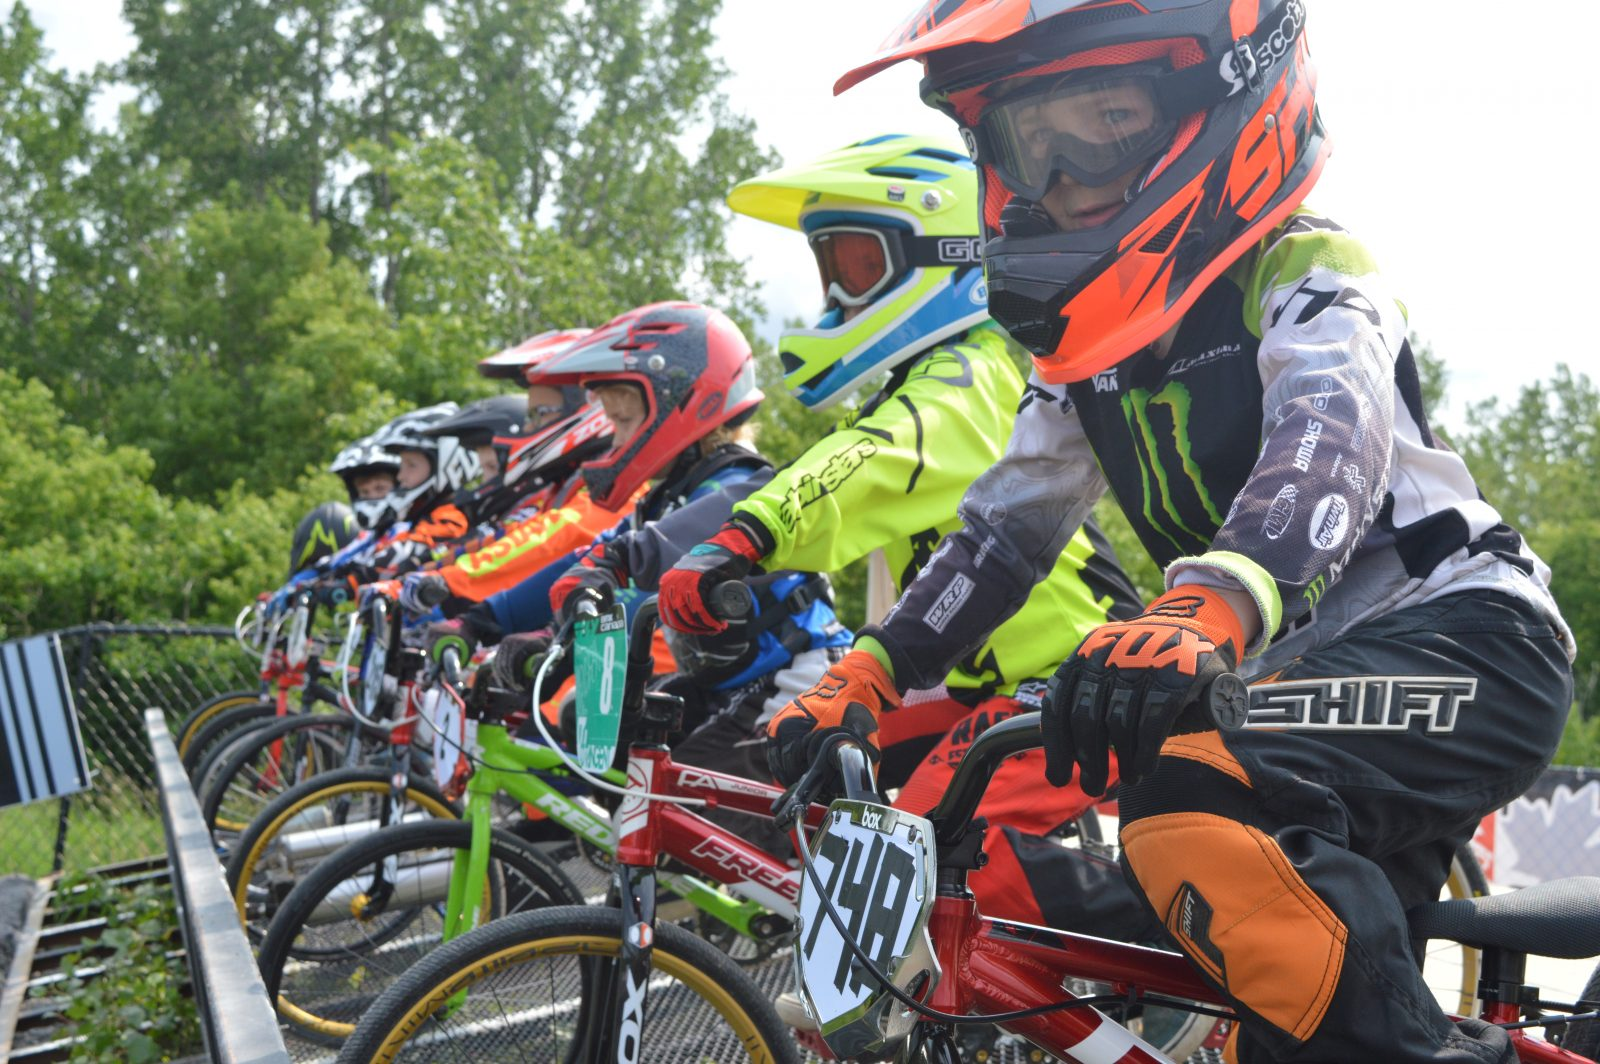 Cornwall BMX sees 500 rider weekend